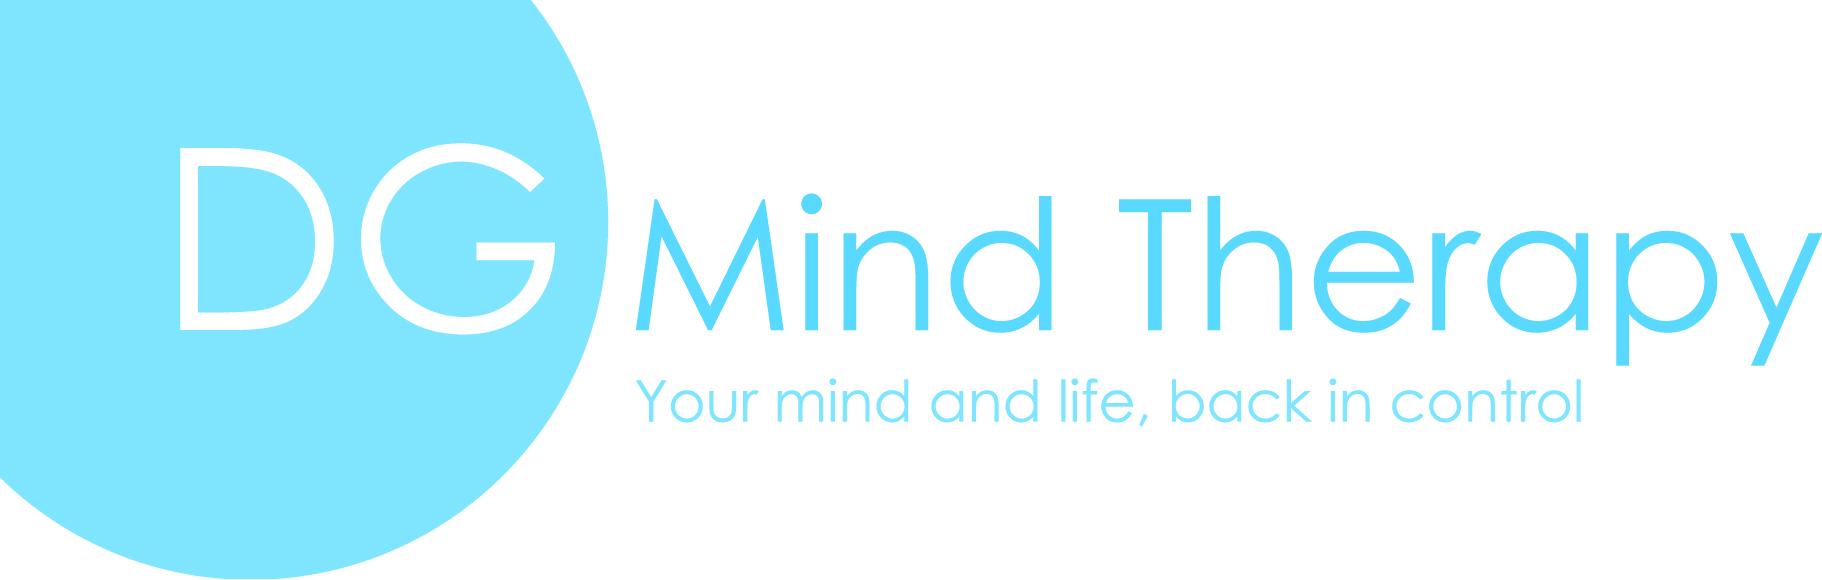 DG MindTherapy